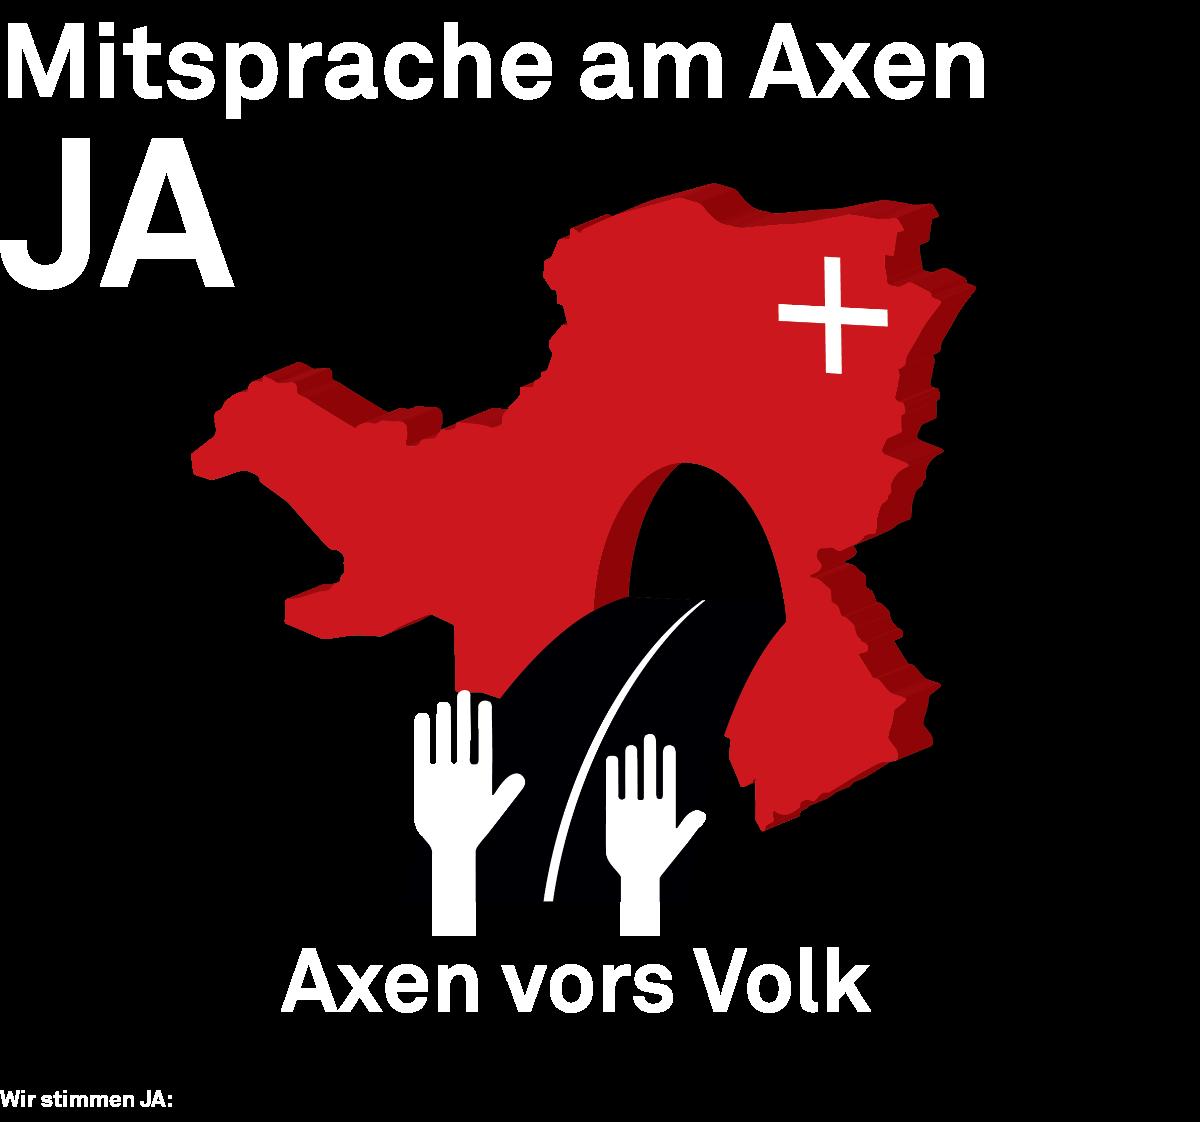 Mitsprache am Axen JA